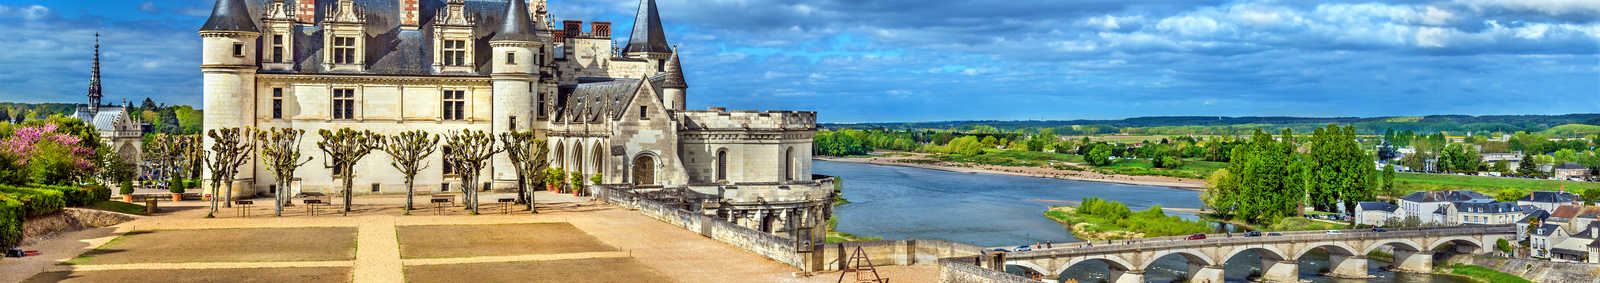 amboise_chateau